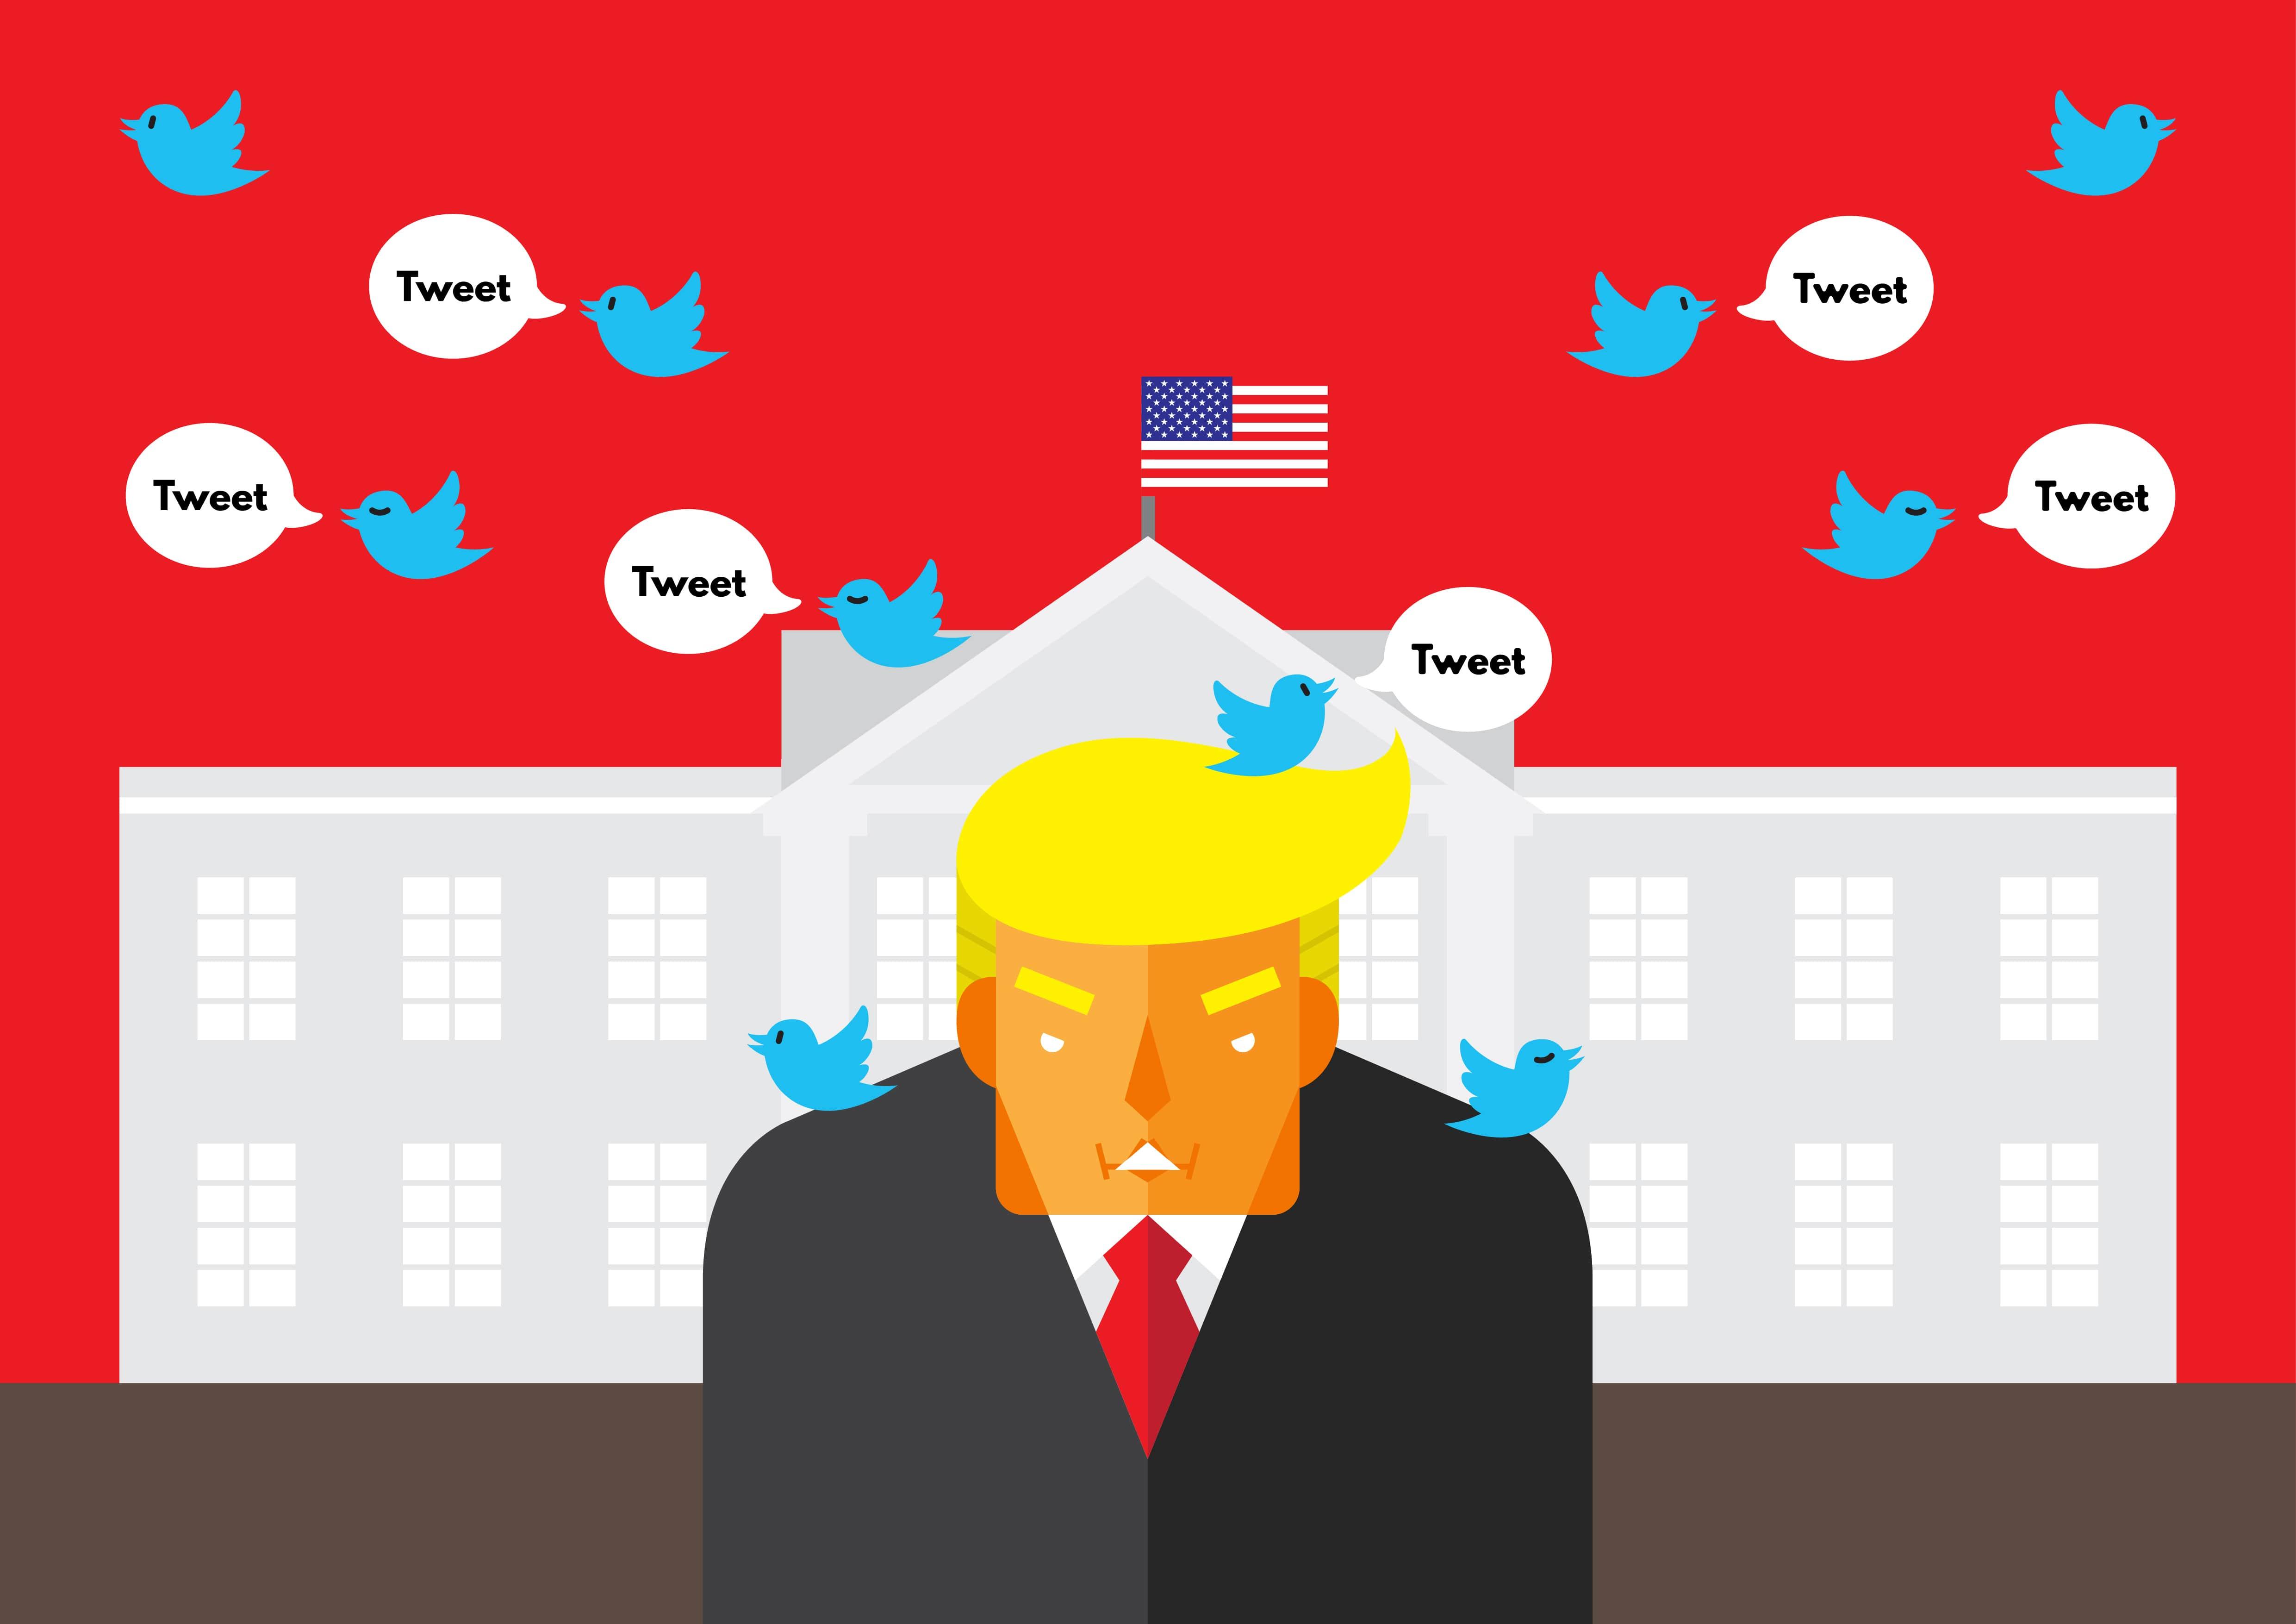 How to use Donald Trump's tactics on social media